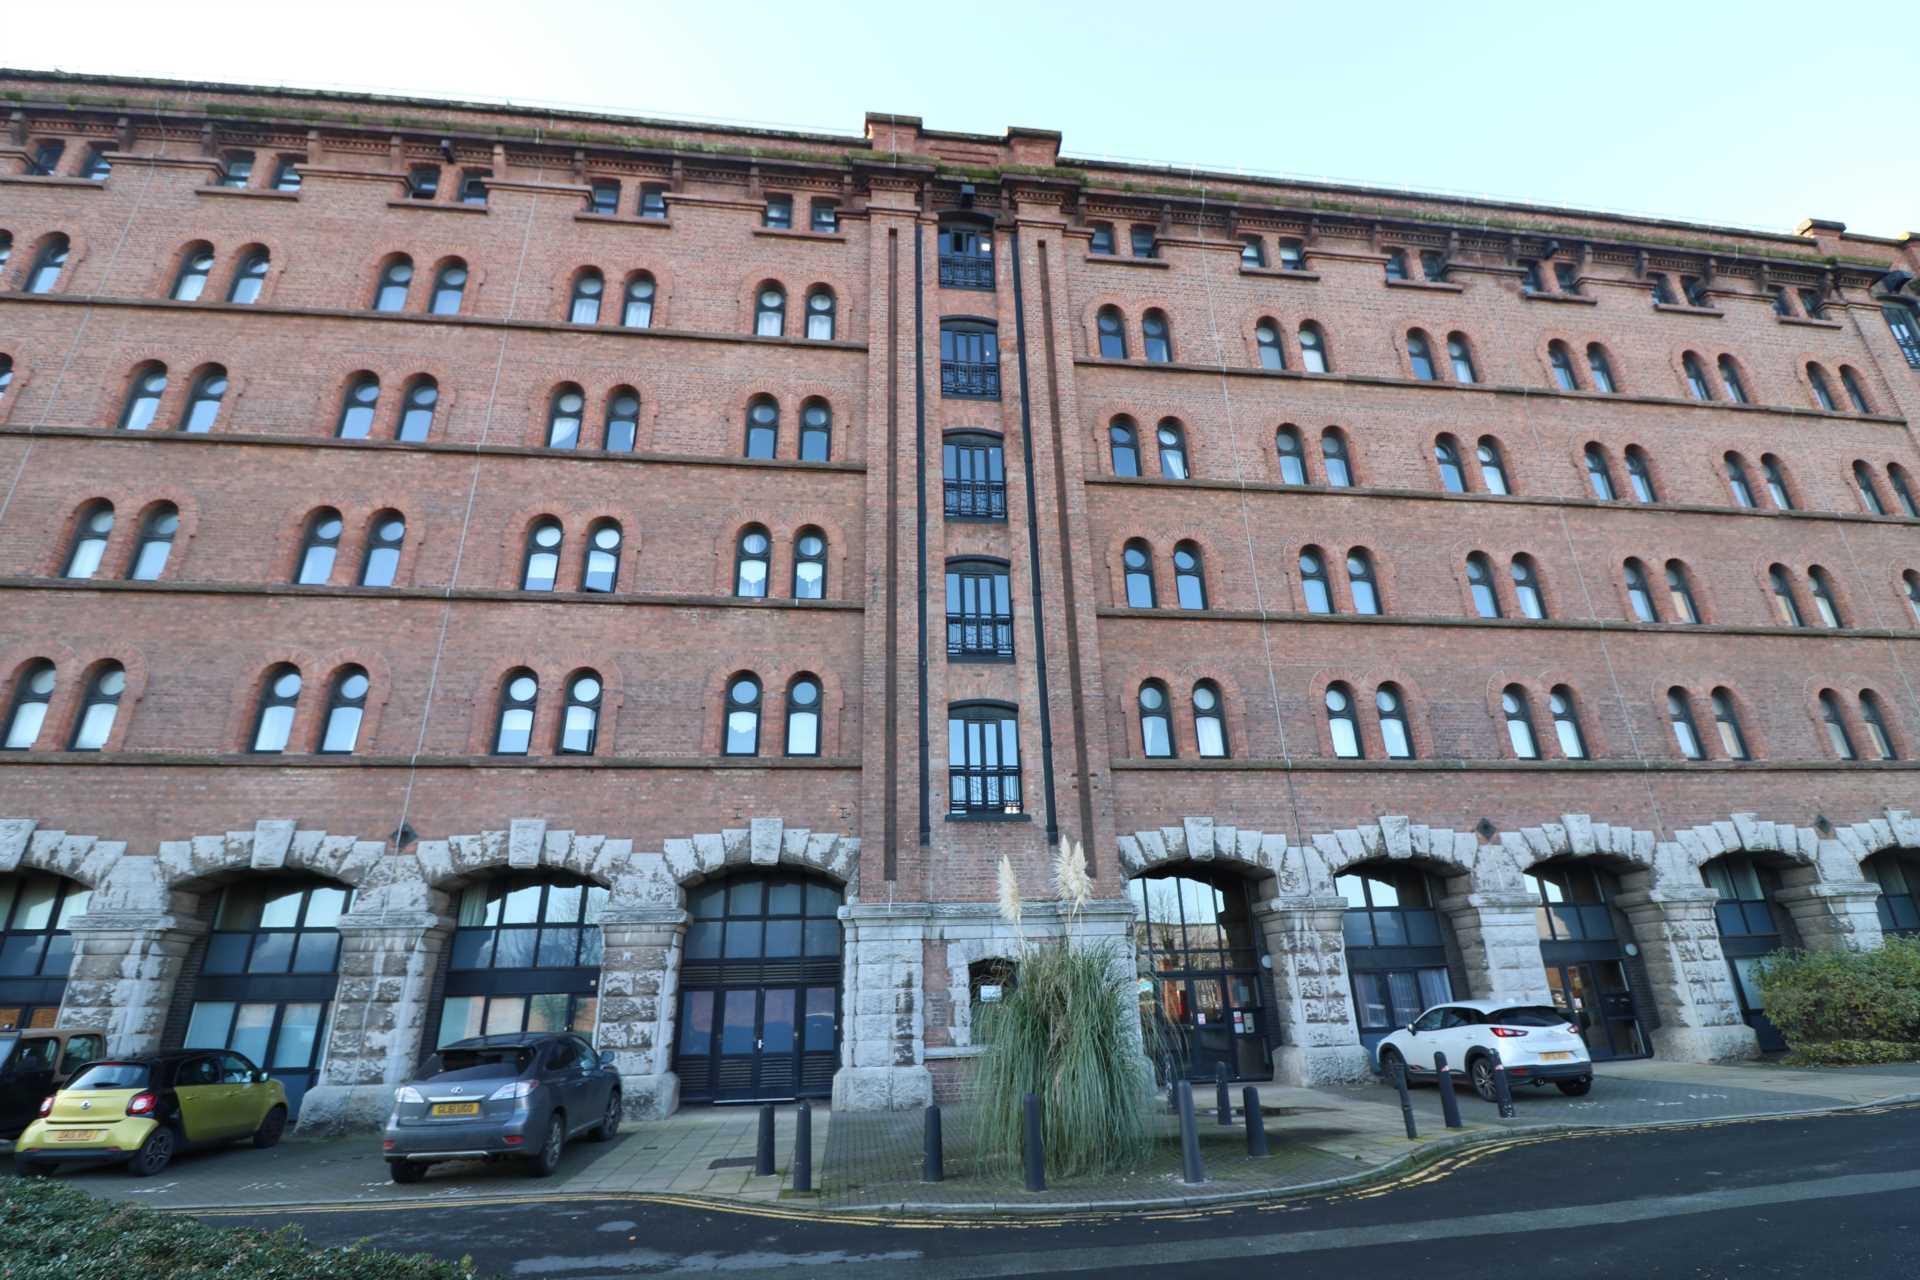 Liverpool, Image 1